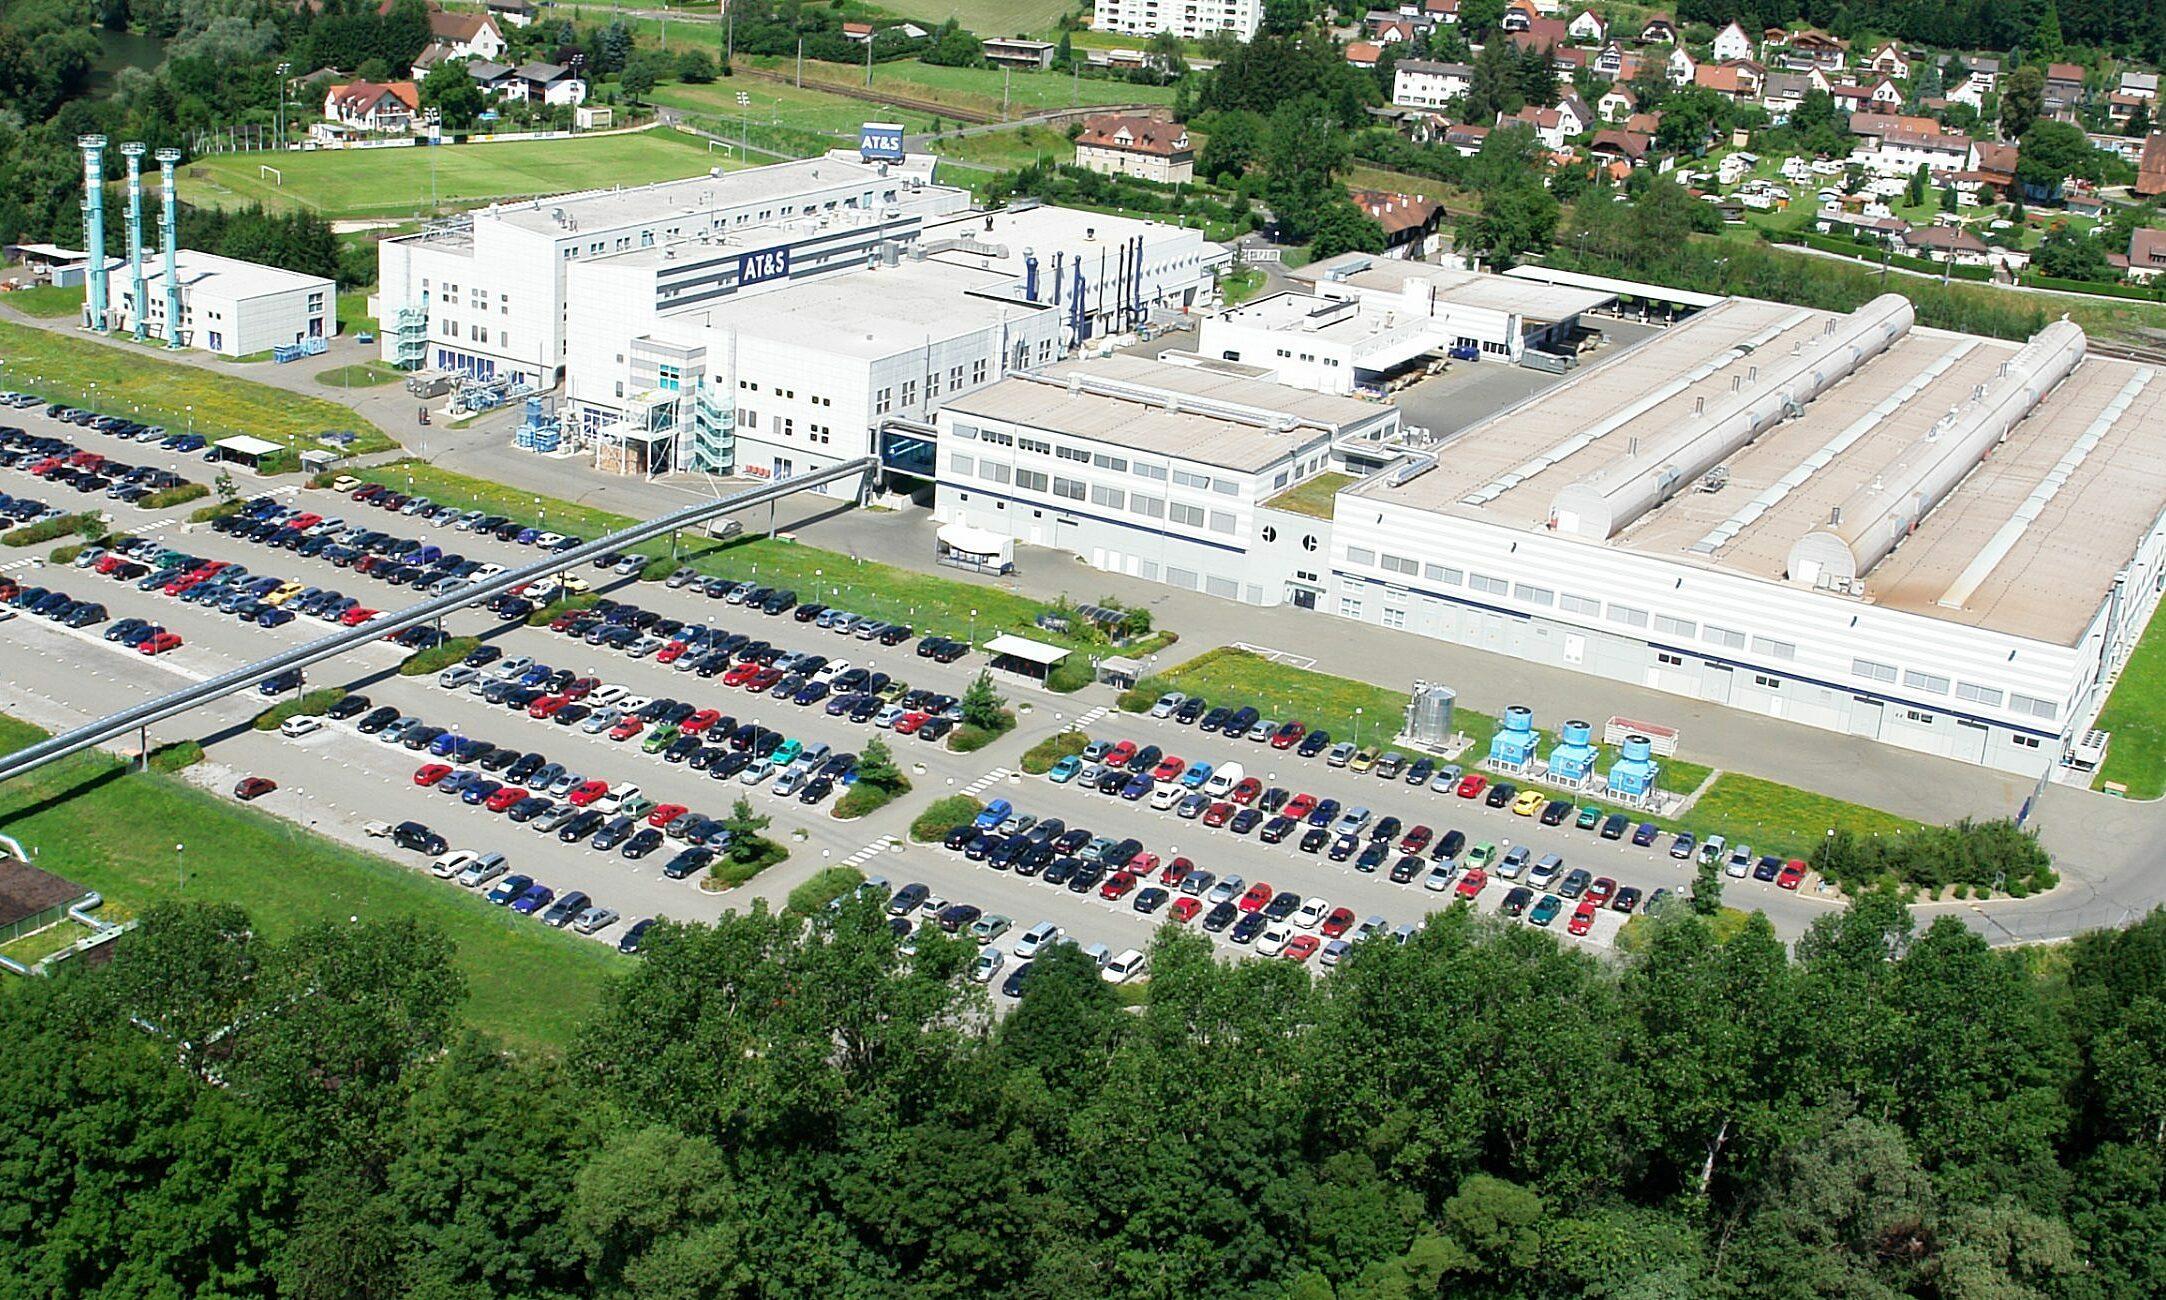 AT&S Headquarter in Leoben city, Austria. Photo courtesy of AT&S.